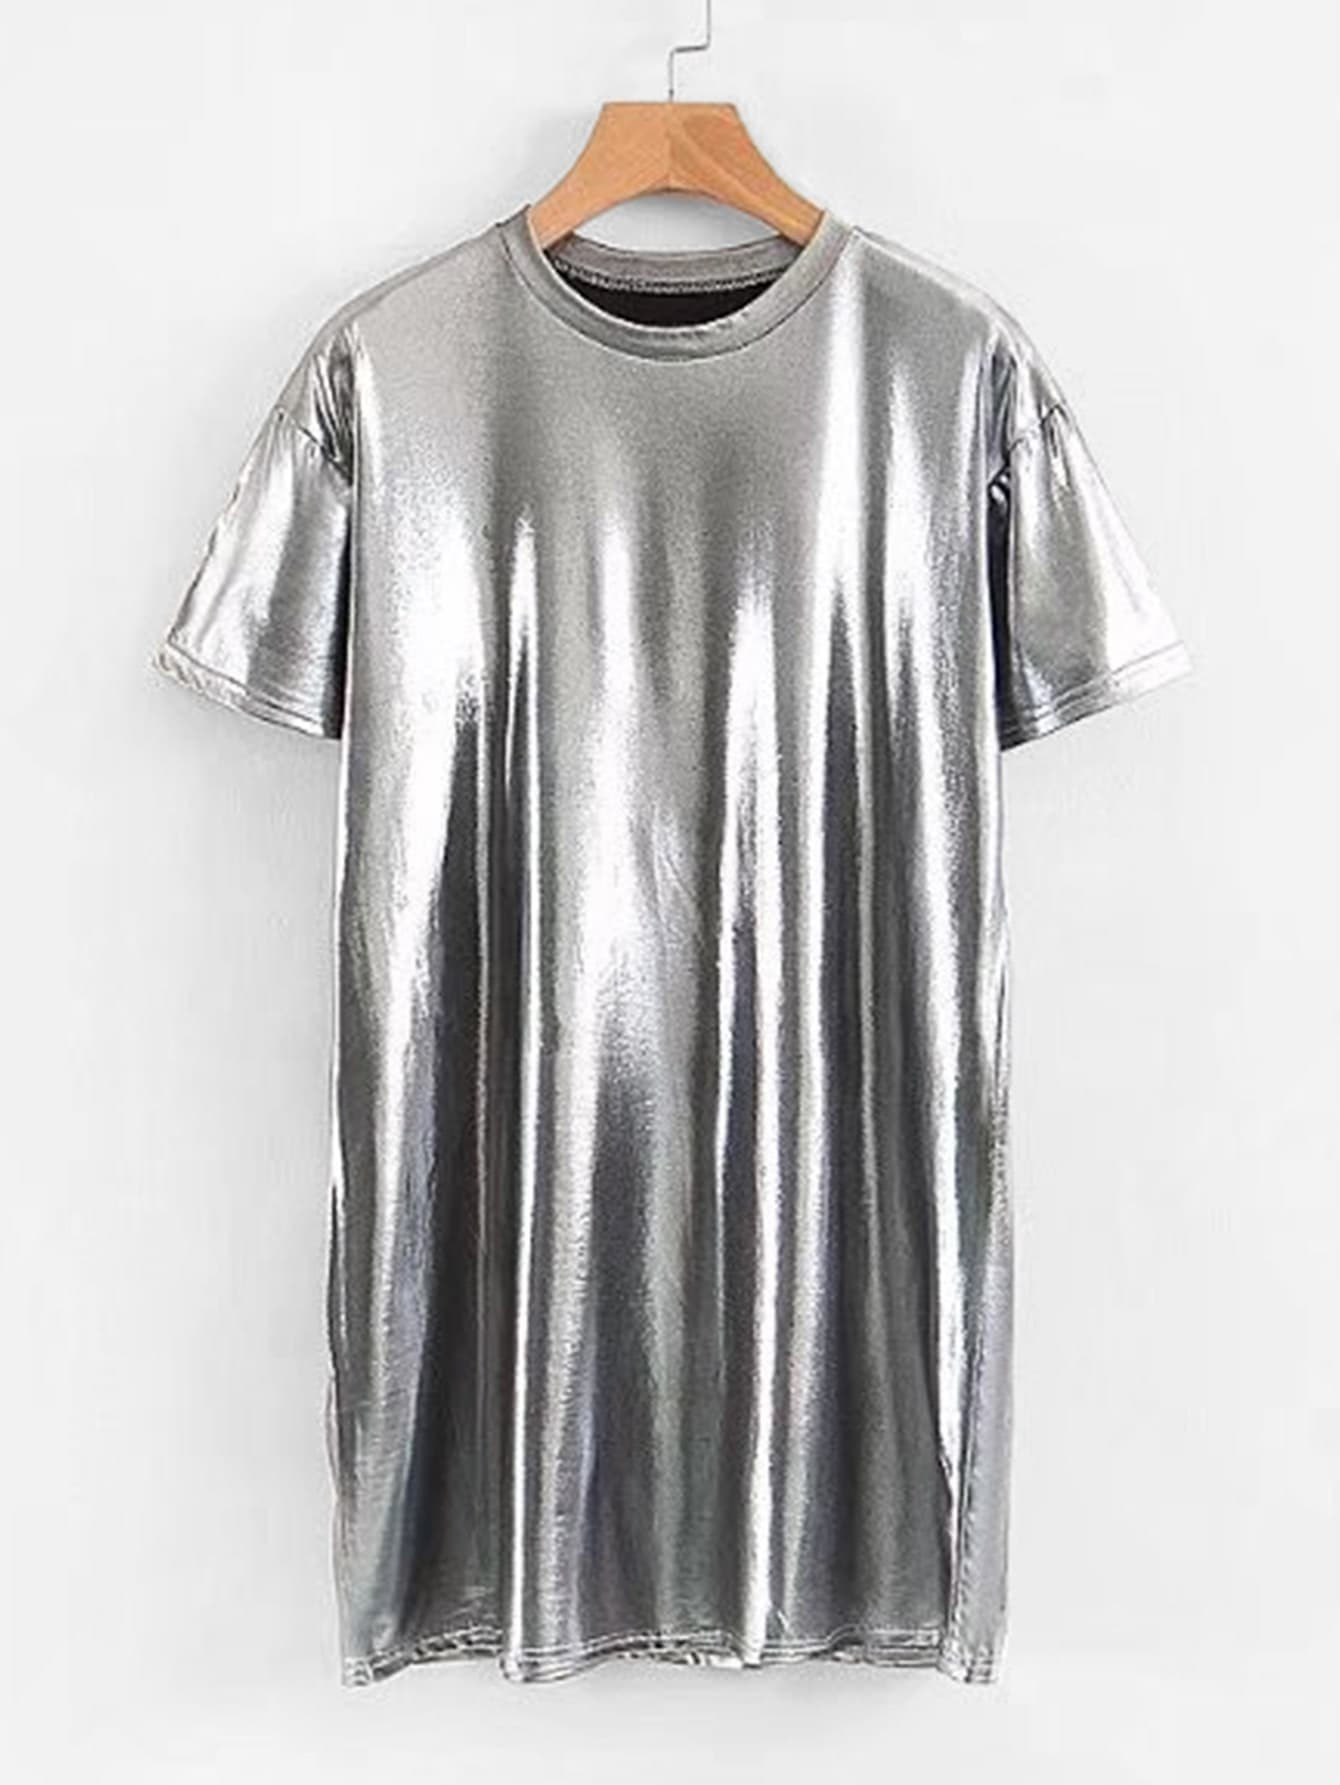 Metallic Tee Dress metallic stretchy slimming tee